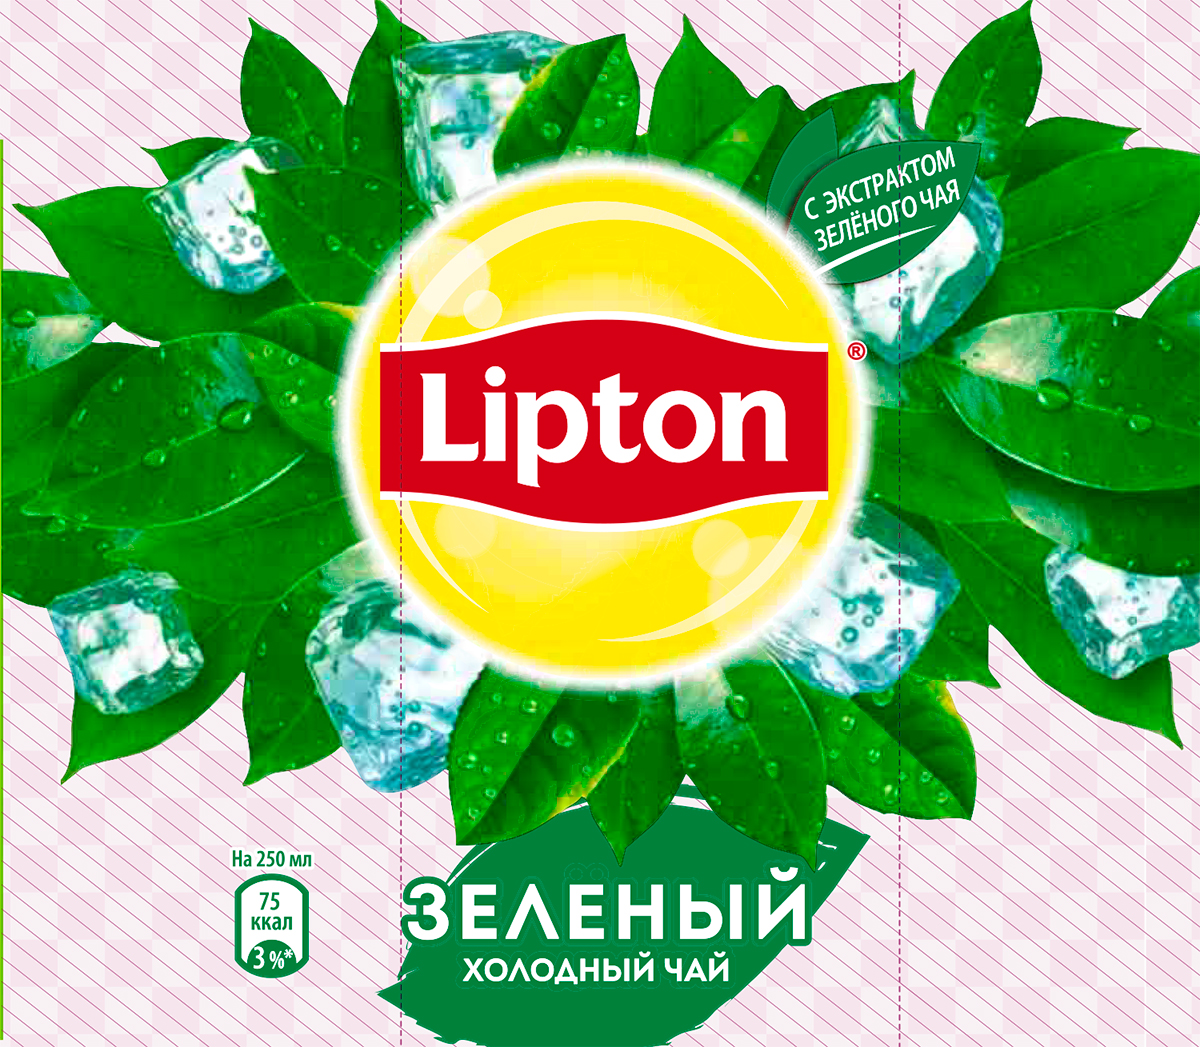 Акция lipton 2021